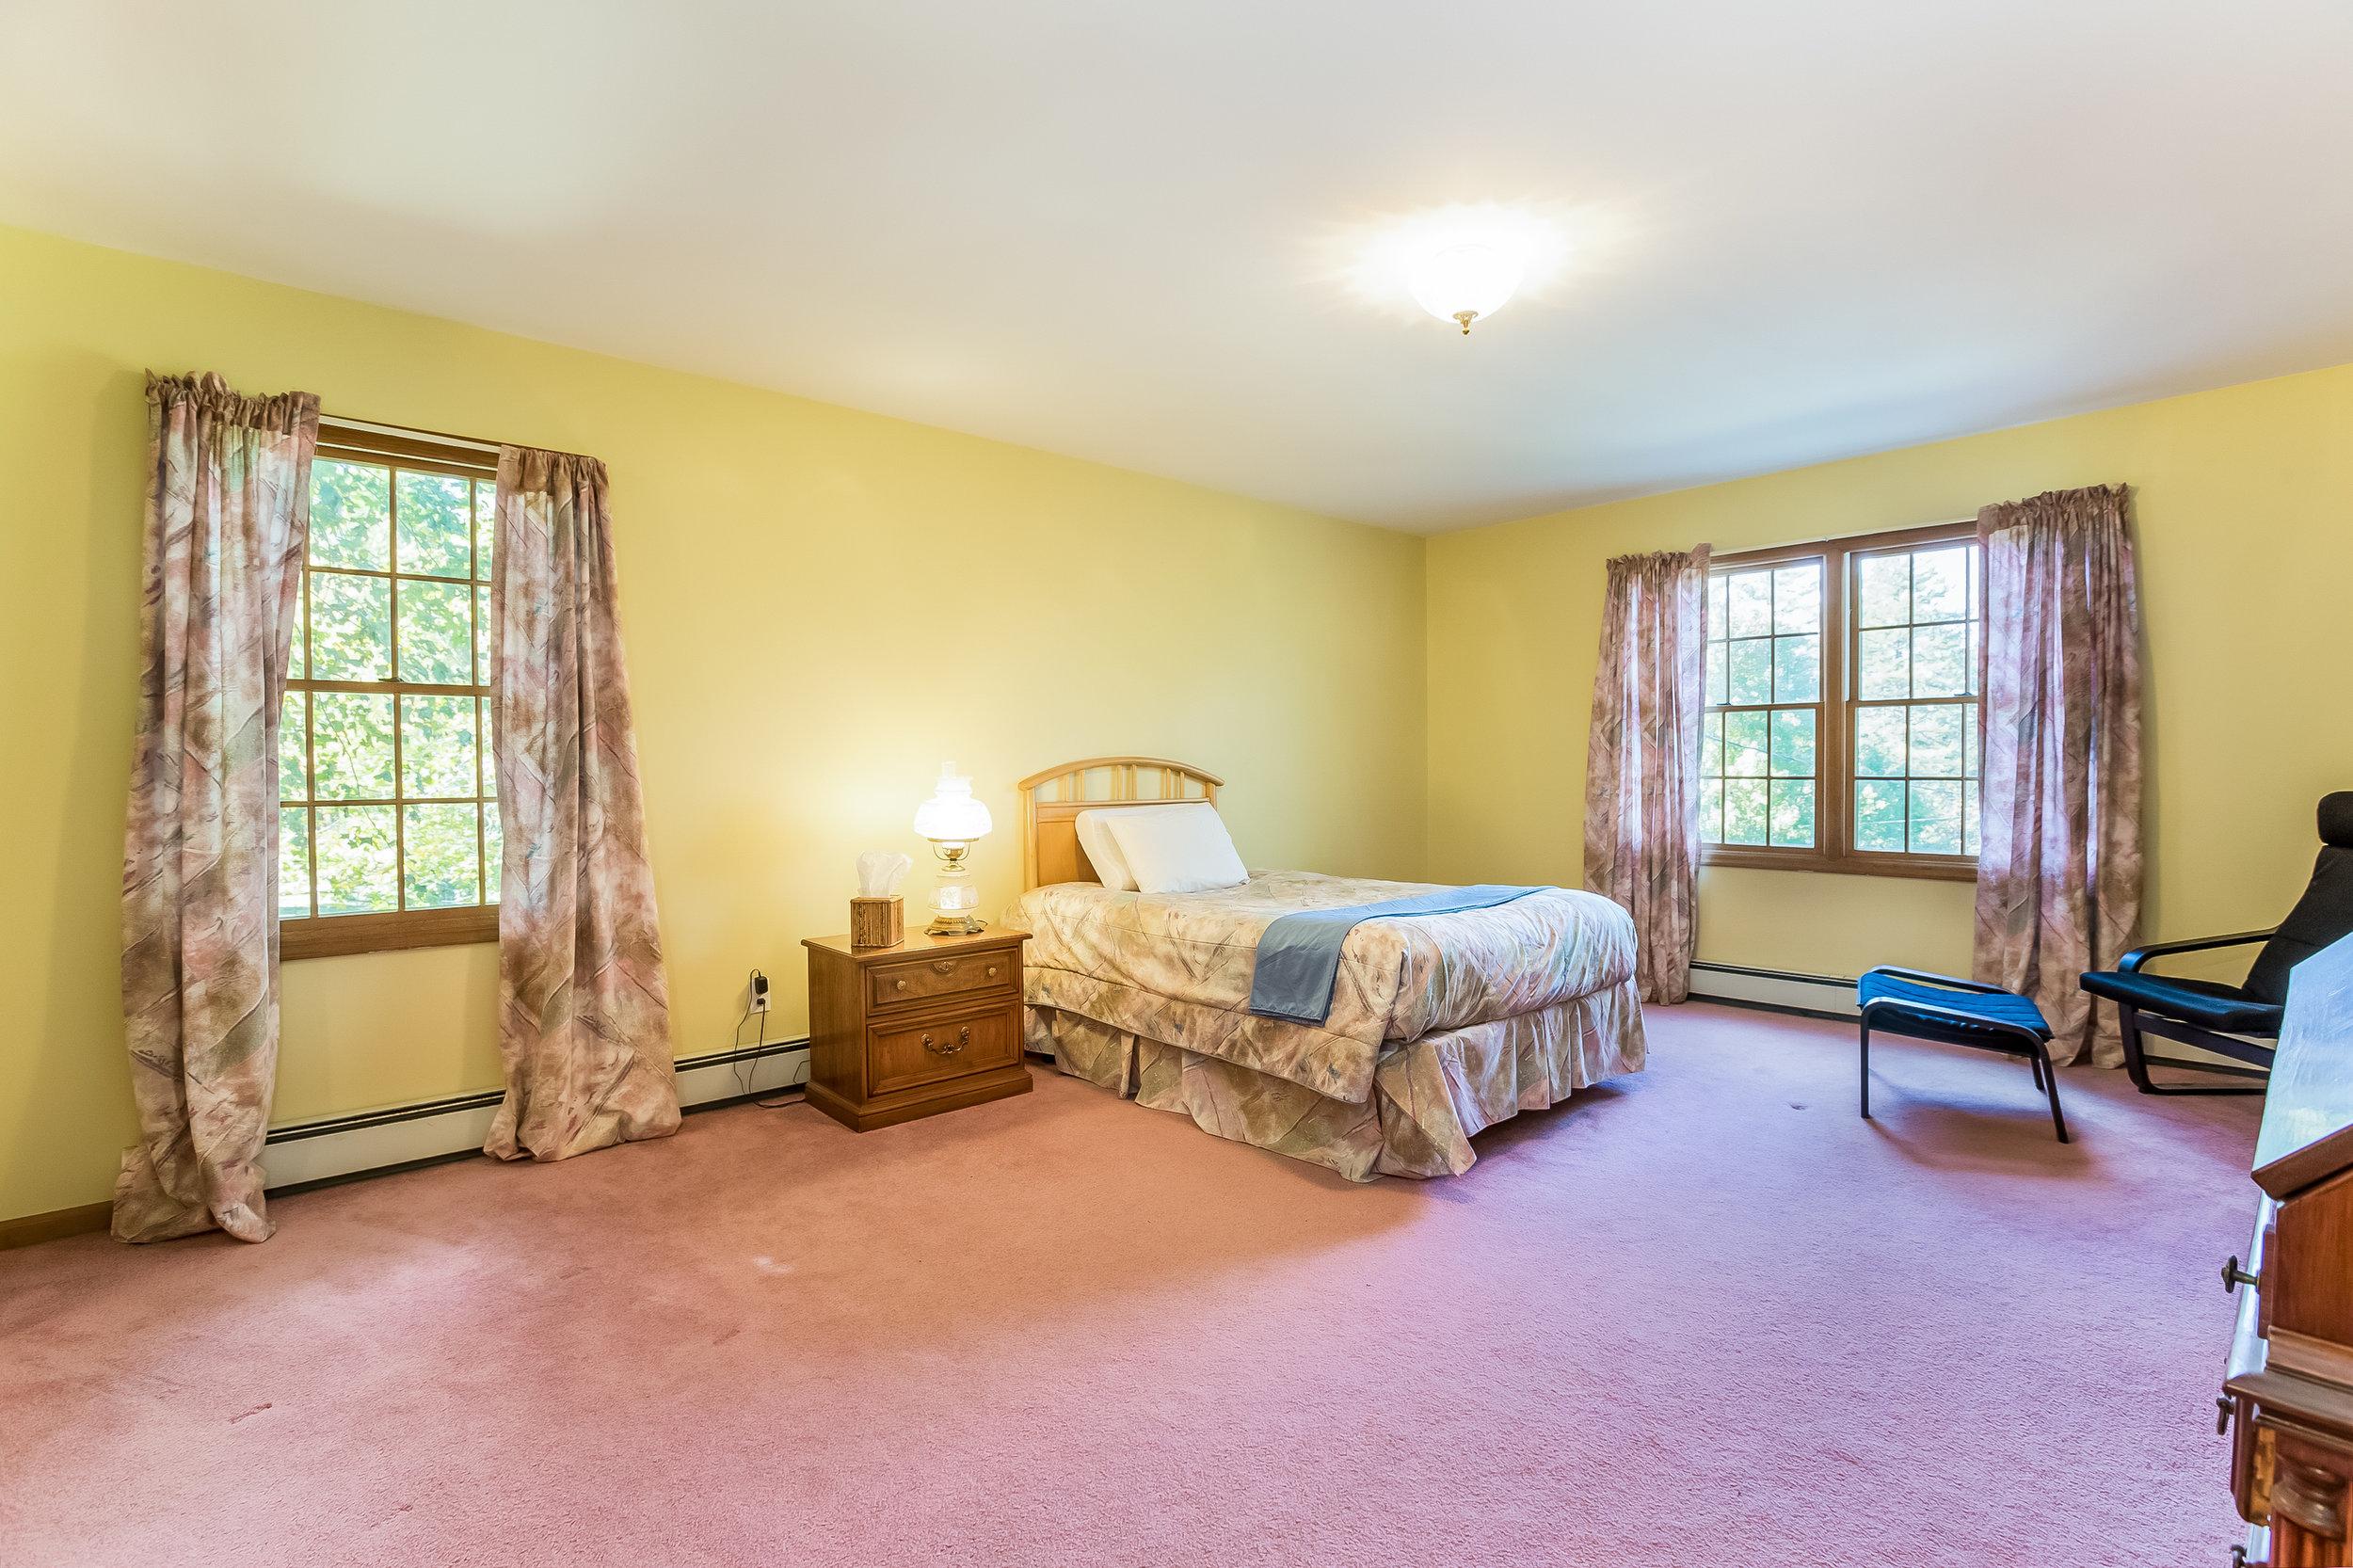 029-Master_Bedroom-5002173-large.jpg